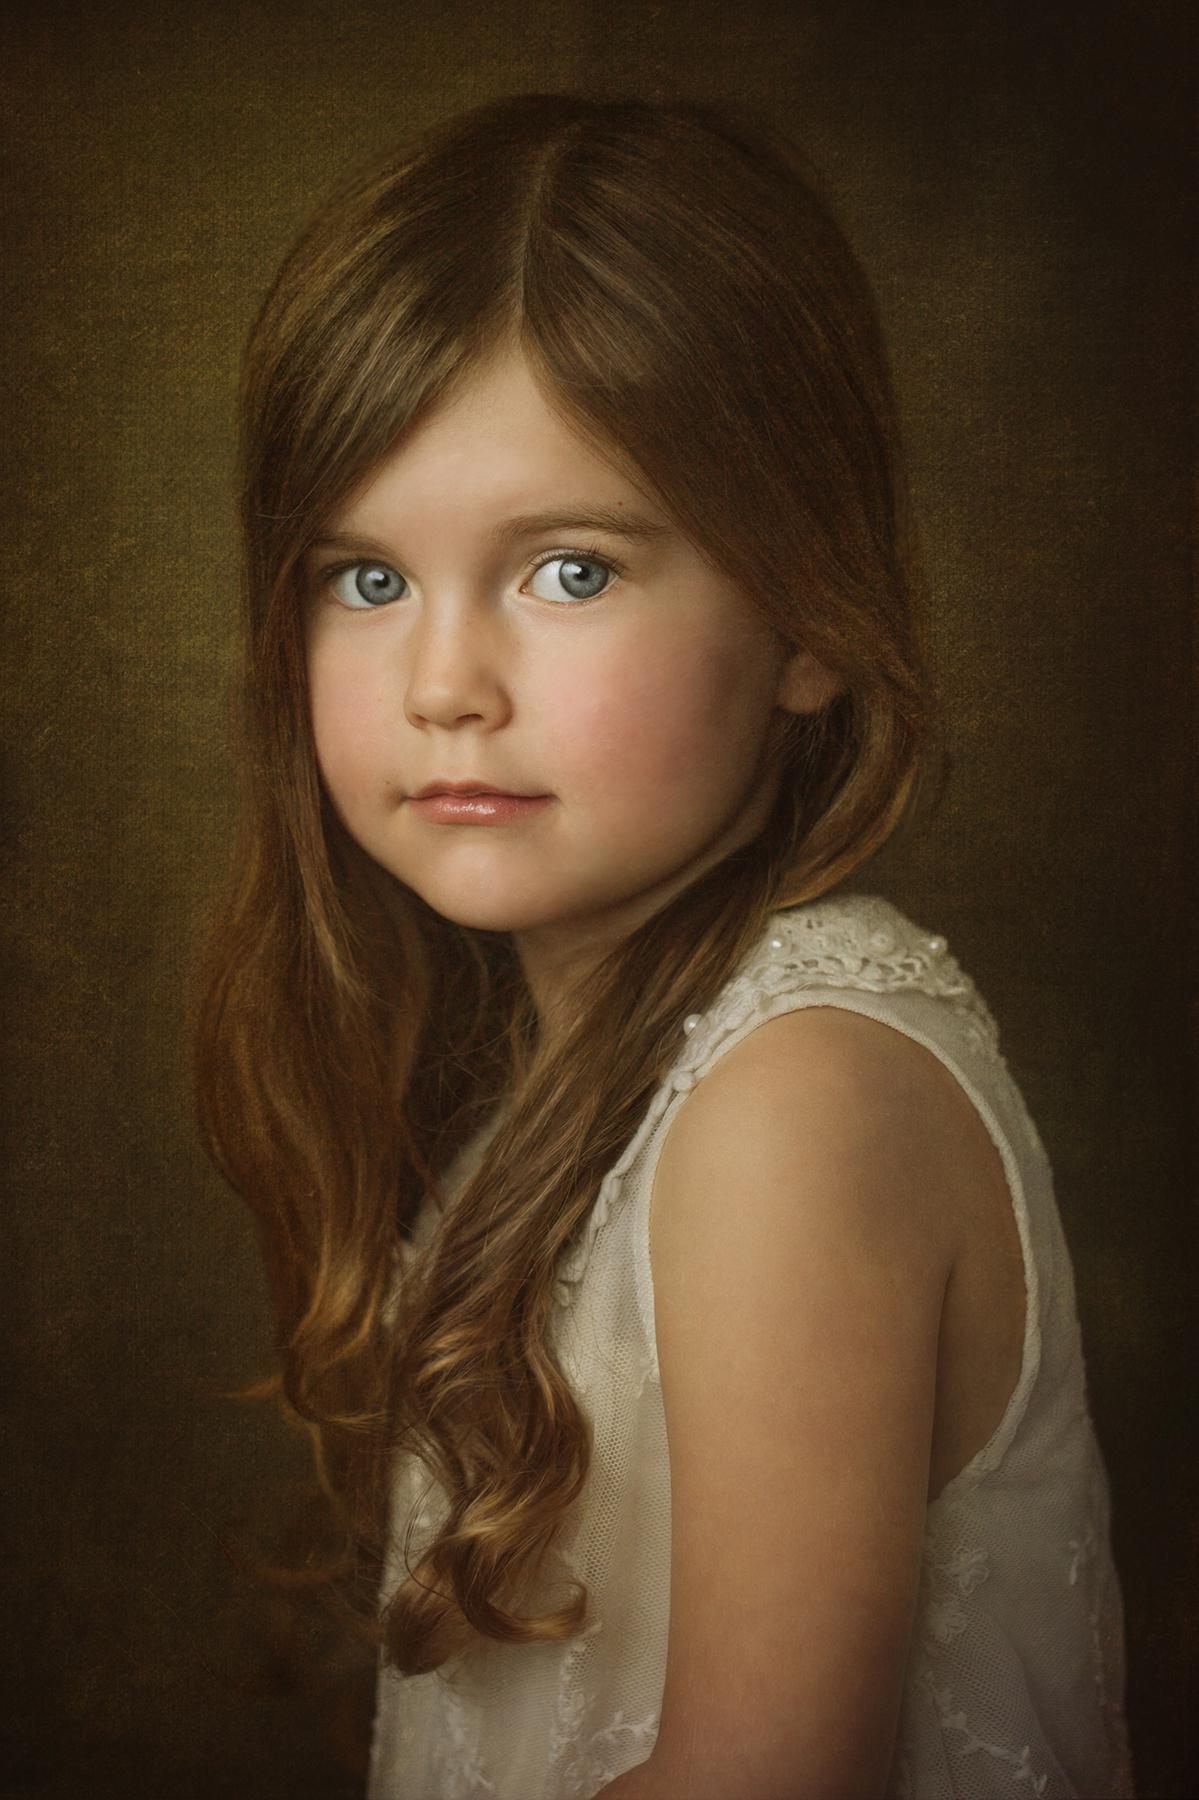 Painted-portrait louise davies photography.jpg